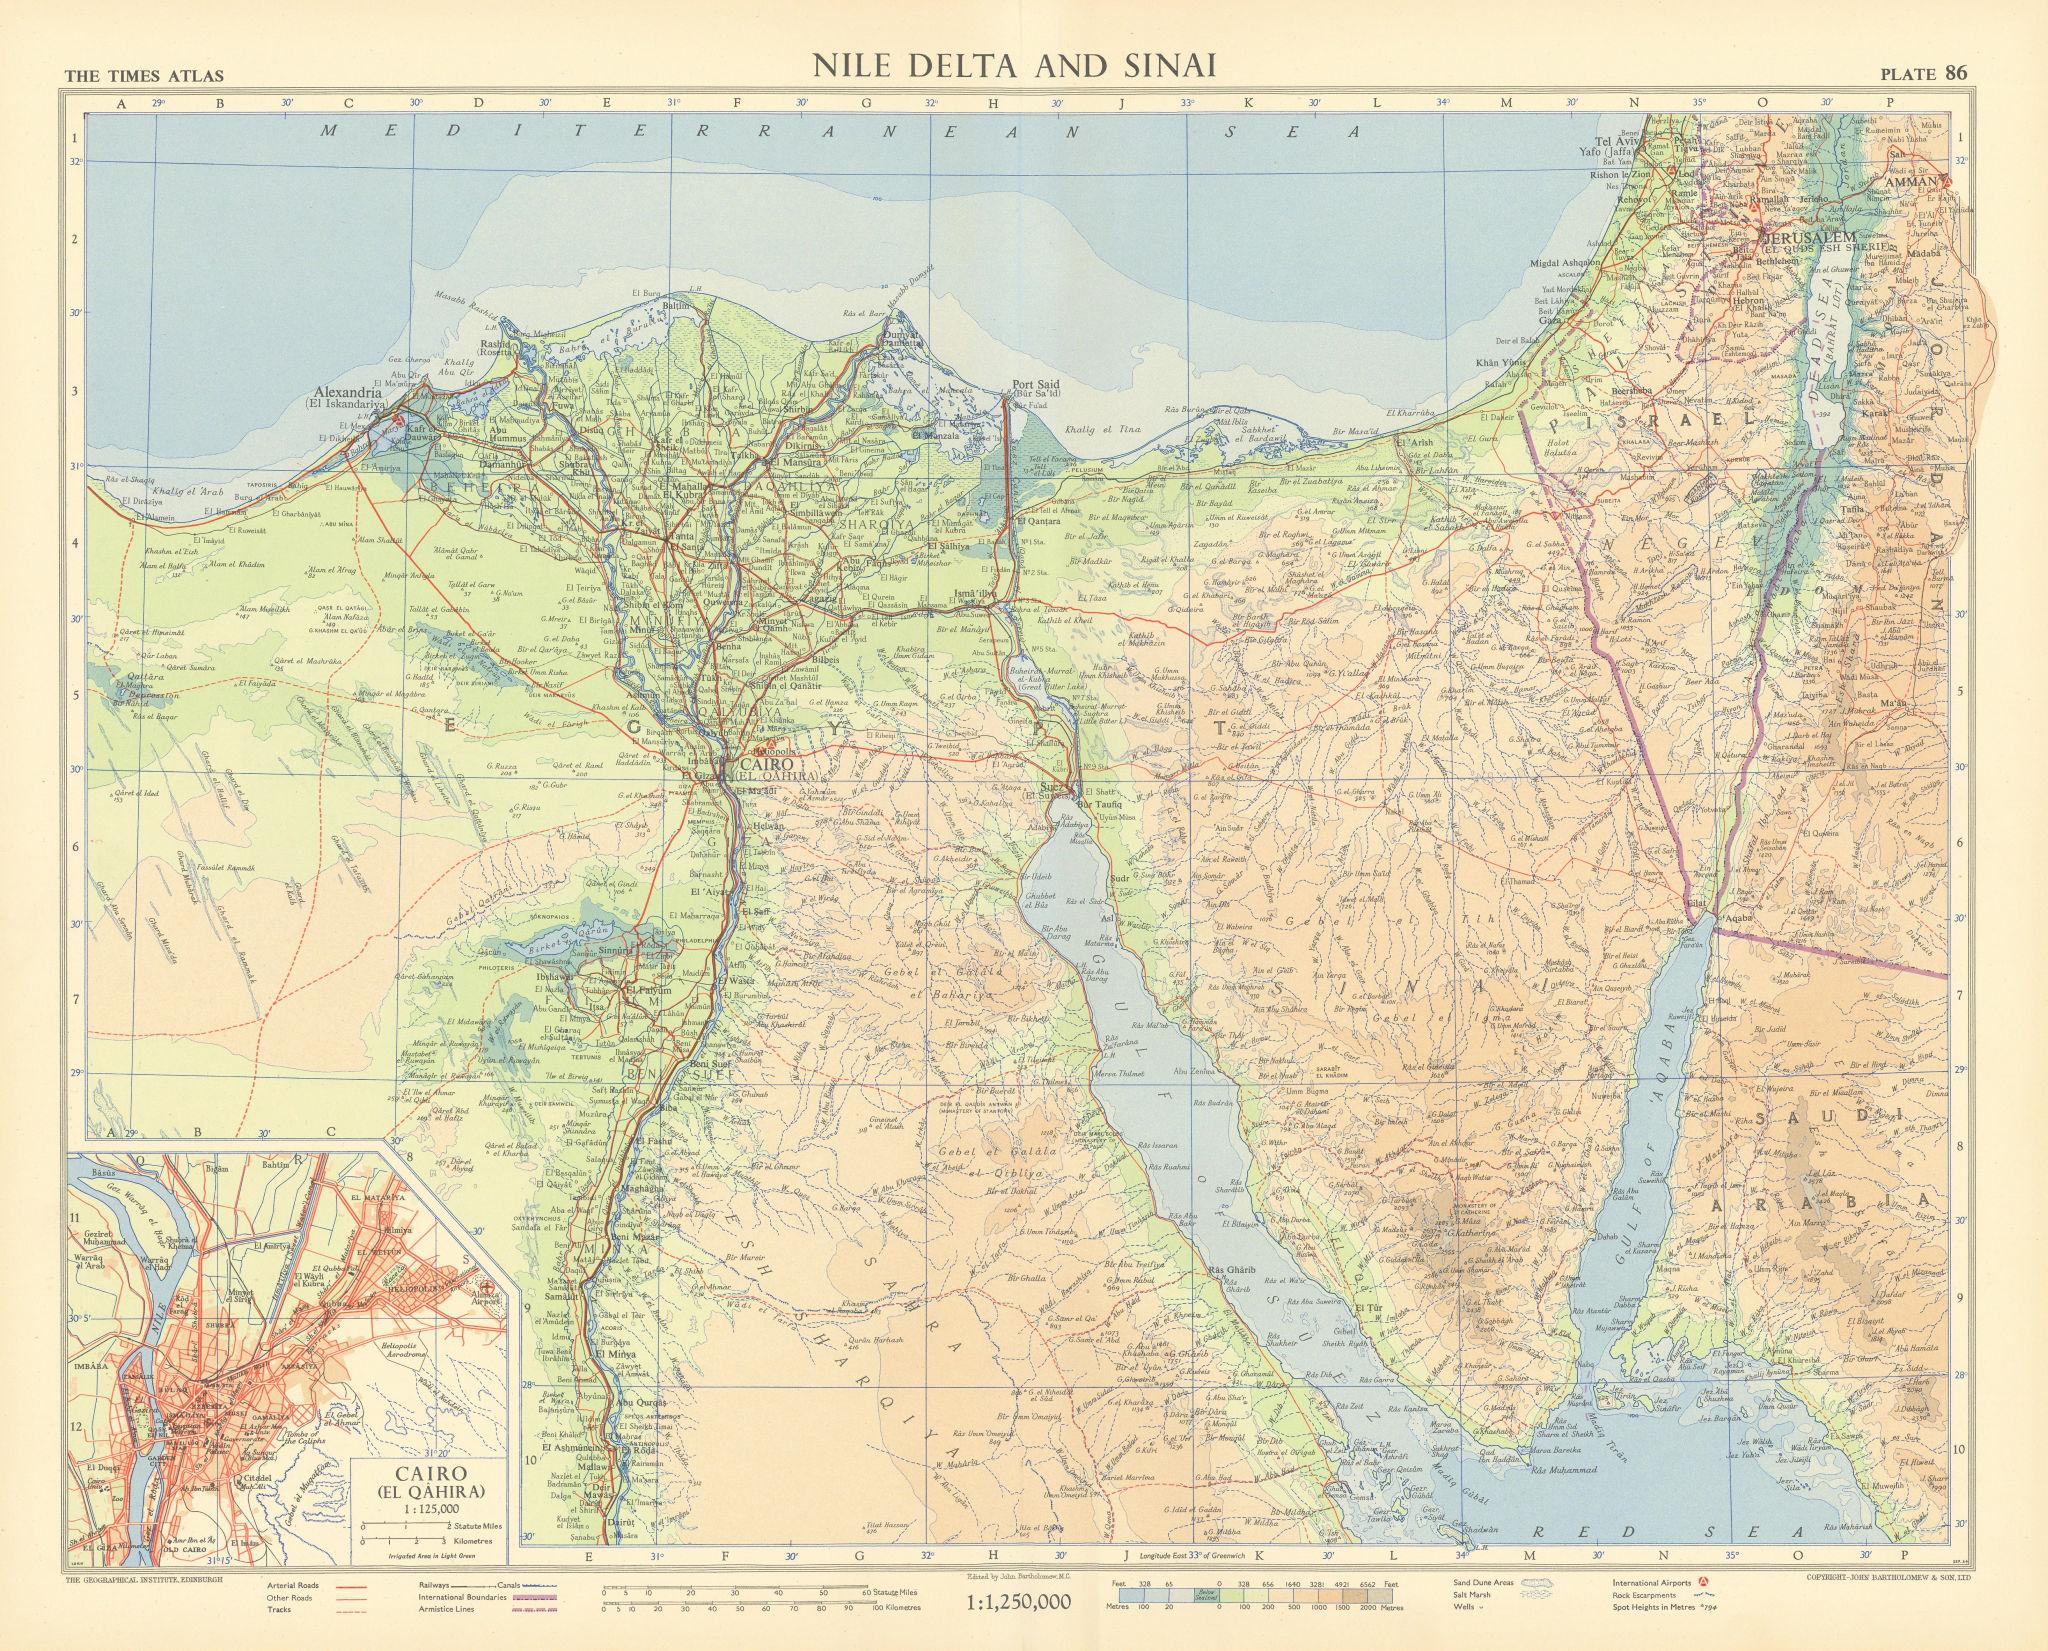 Nile Delta and Sinai. Cairo plan. Egypt. Eilat. Sharm el Sheikh. TIMES 1956 map